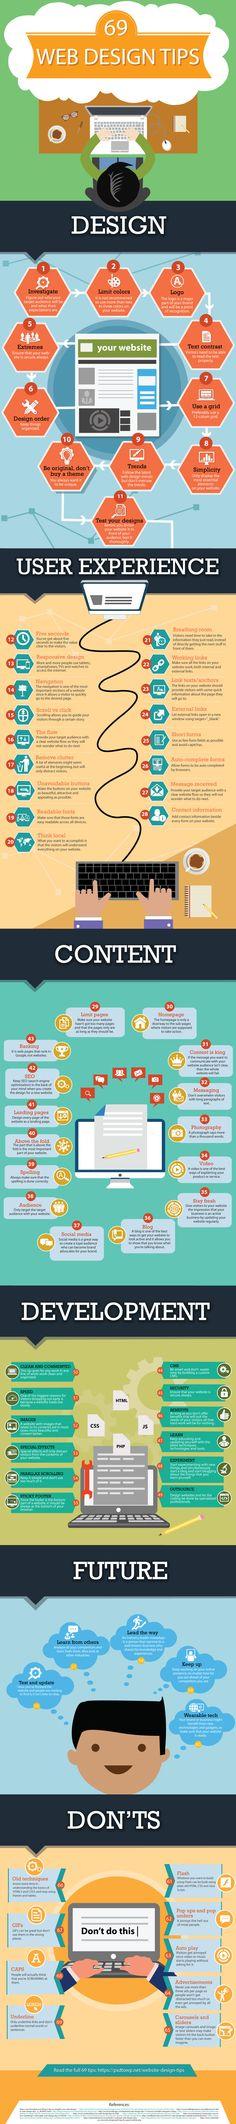 Infographic: 69 Web Design Tips